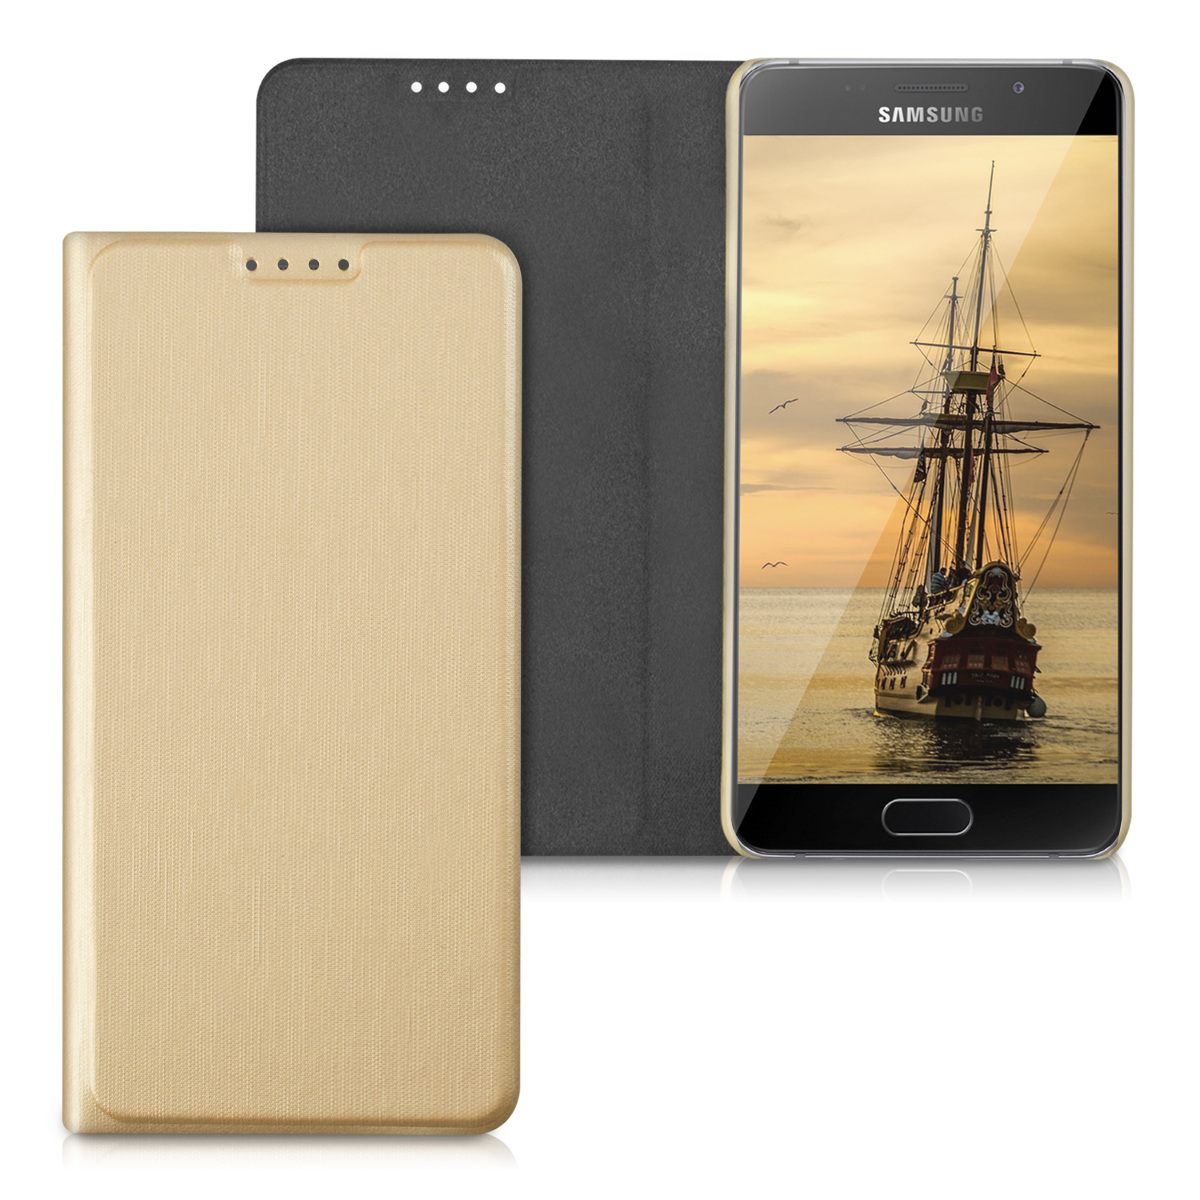 Funda-para-Samsung-Galaxy-a5-2016-funda-de-movil-movil-funda-flip-cover-smartphone